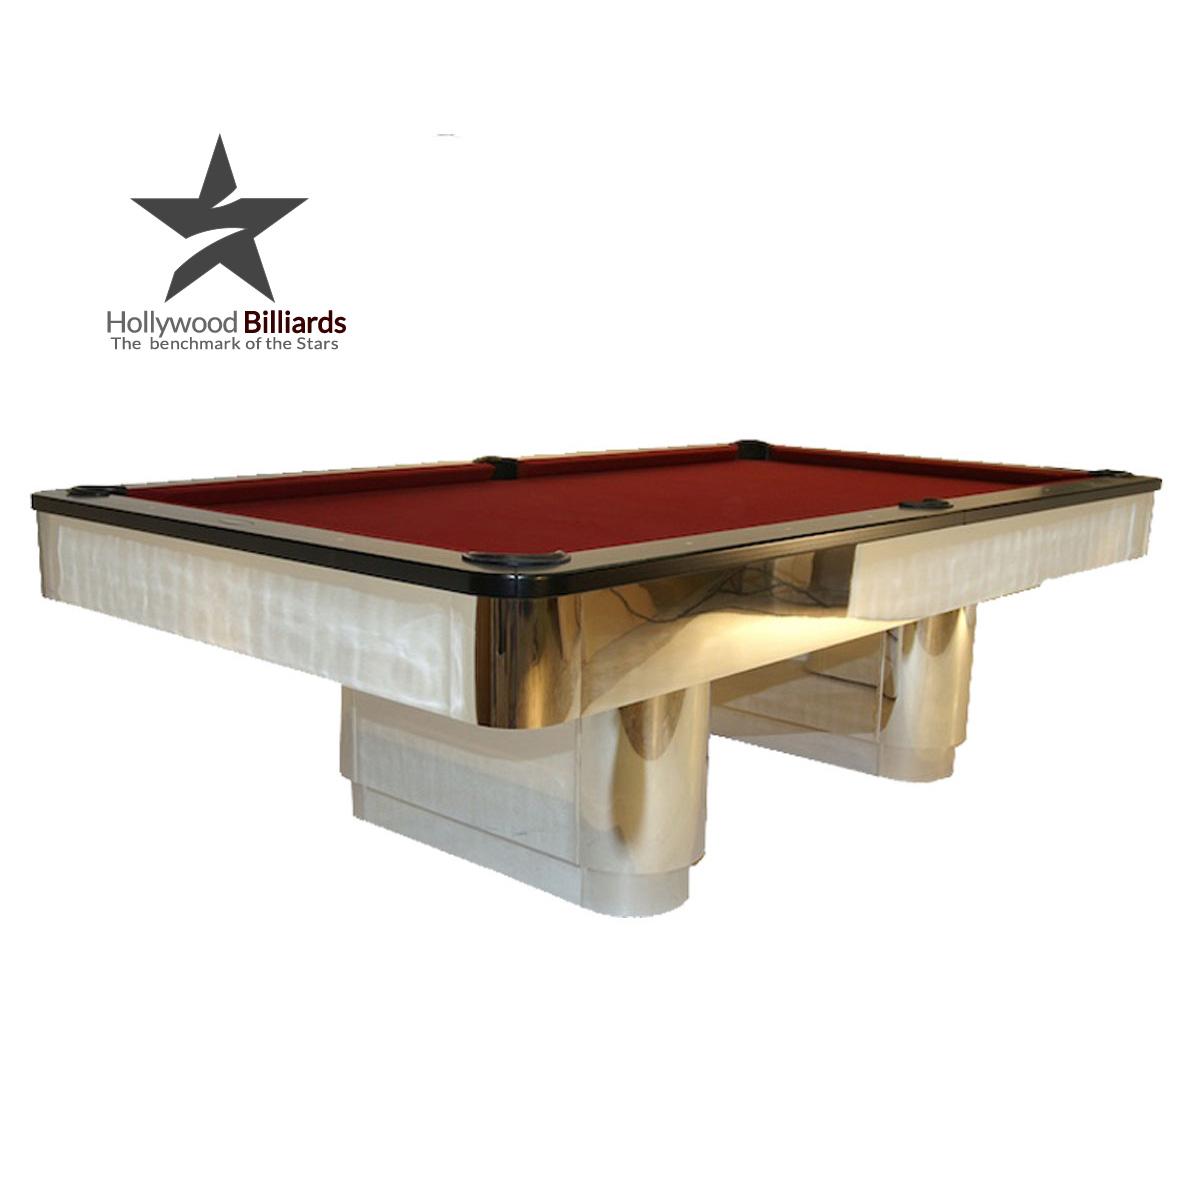 The Bridgeport Modern Pool Table